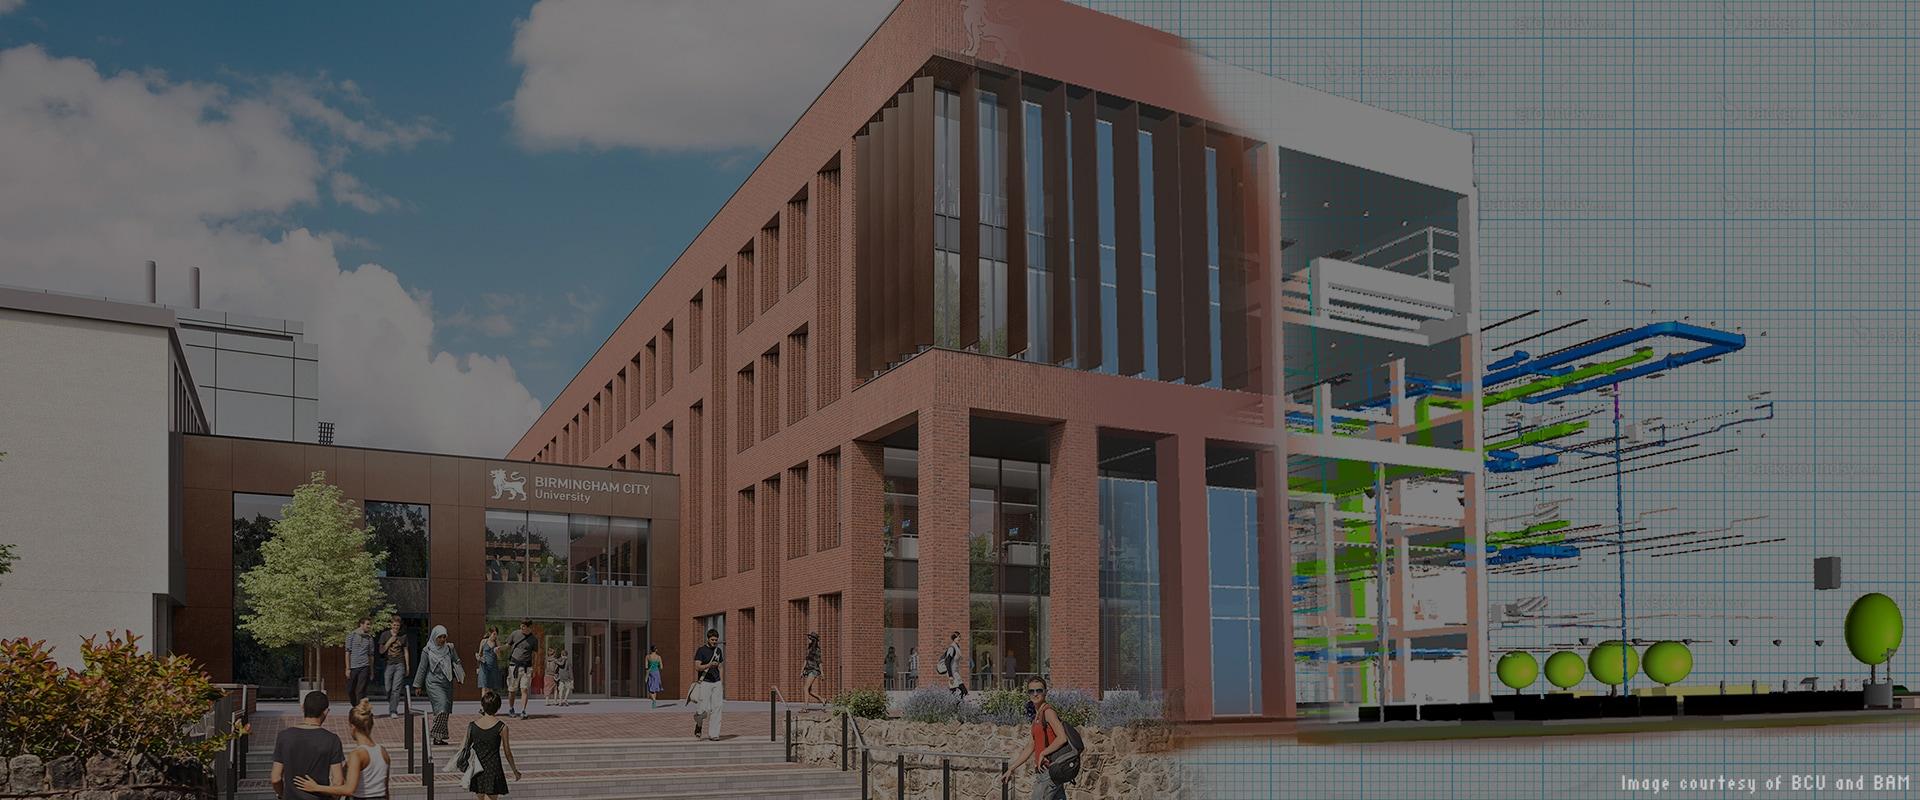 Bcu Customer Service >> AEC Excellence Awards | BCU BAM Construct UK | Autodesk